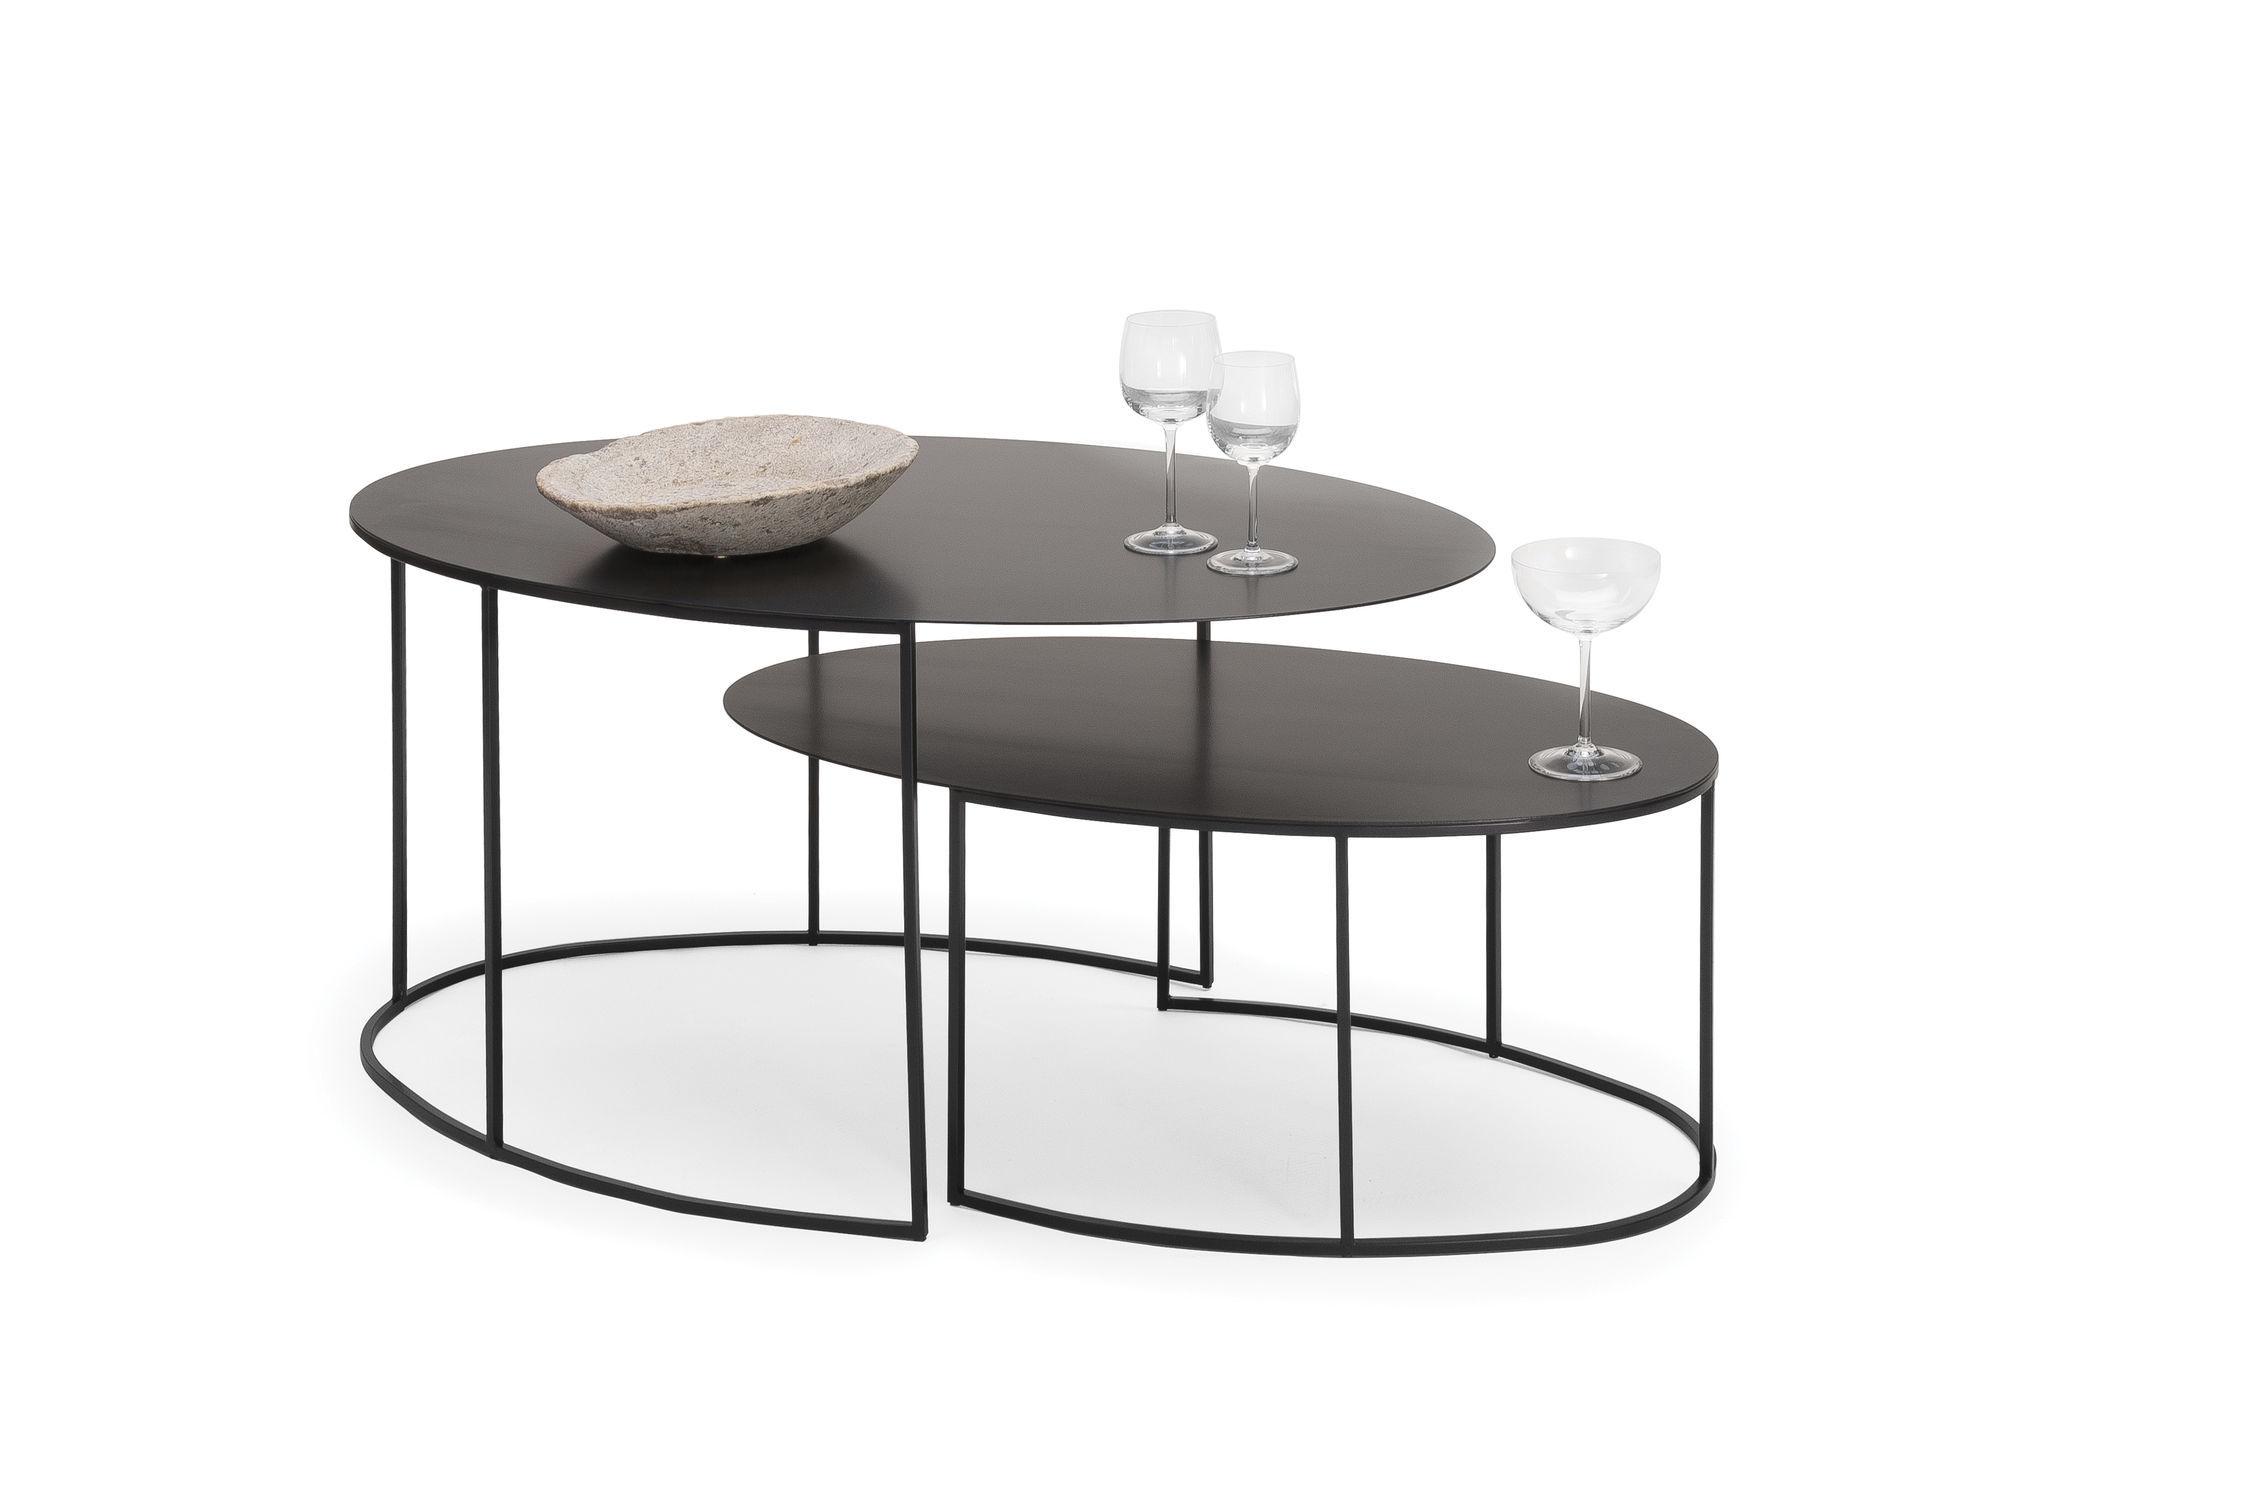 Table Cuivre Ovale Gigogne Slim By En Irony Contemporaine wnkZ0N8PXO